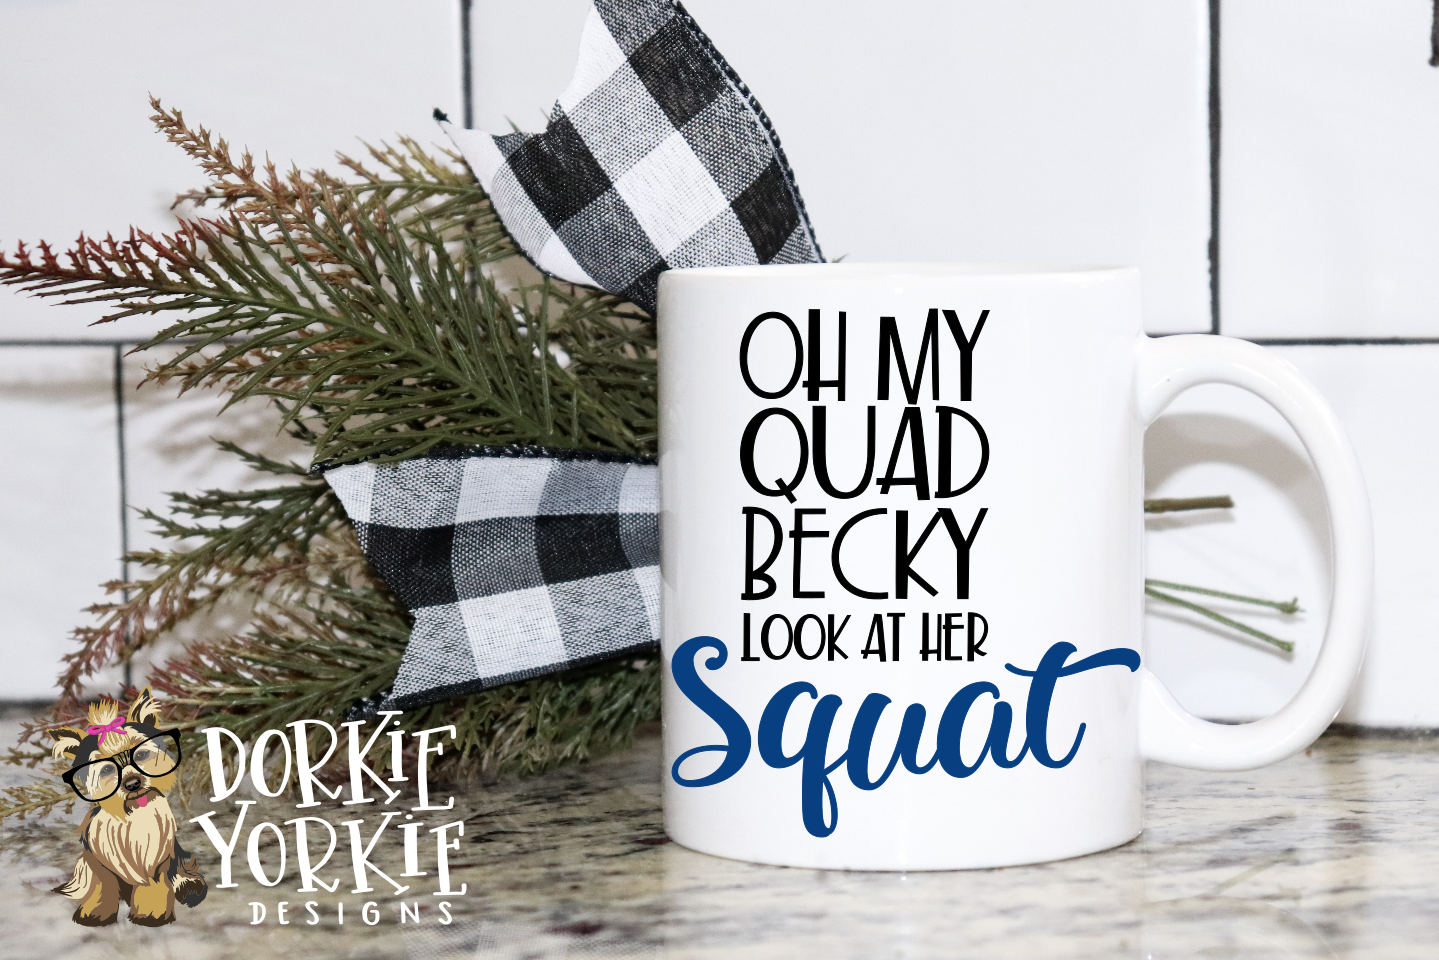 I work out, just kidding BUNDLE - Gym, funny, workout - SVG example image 3